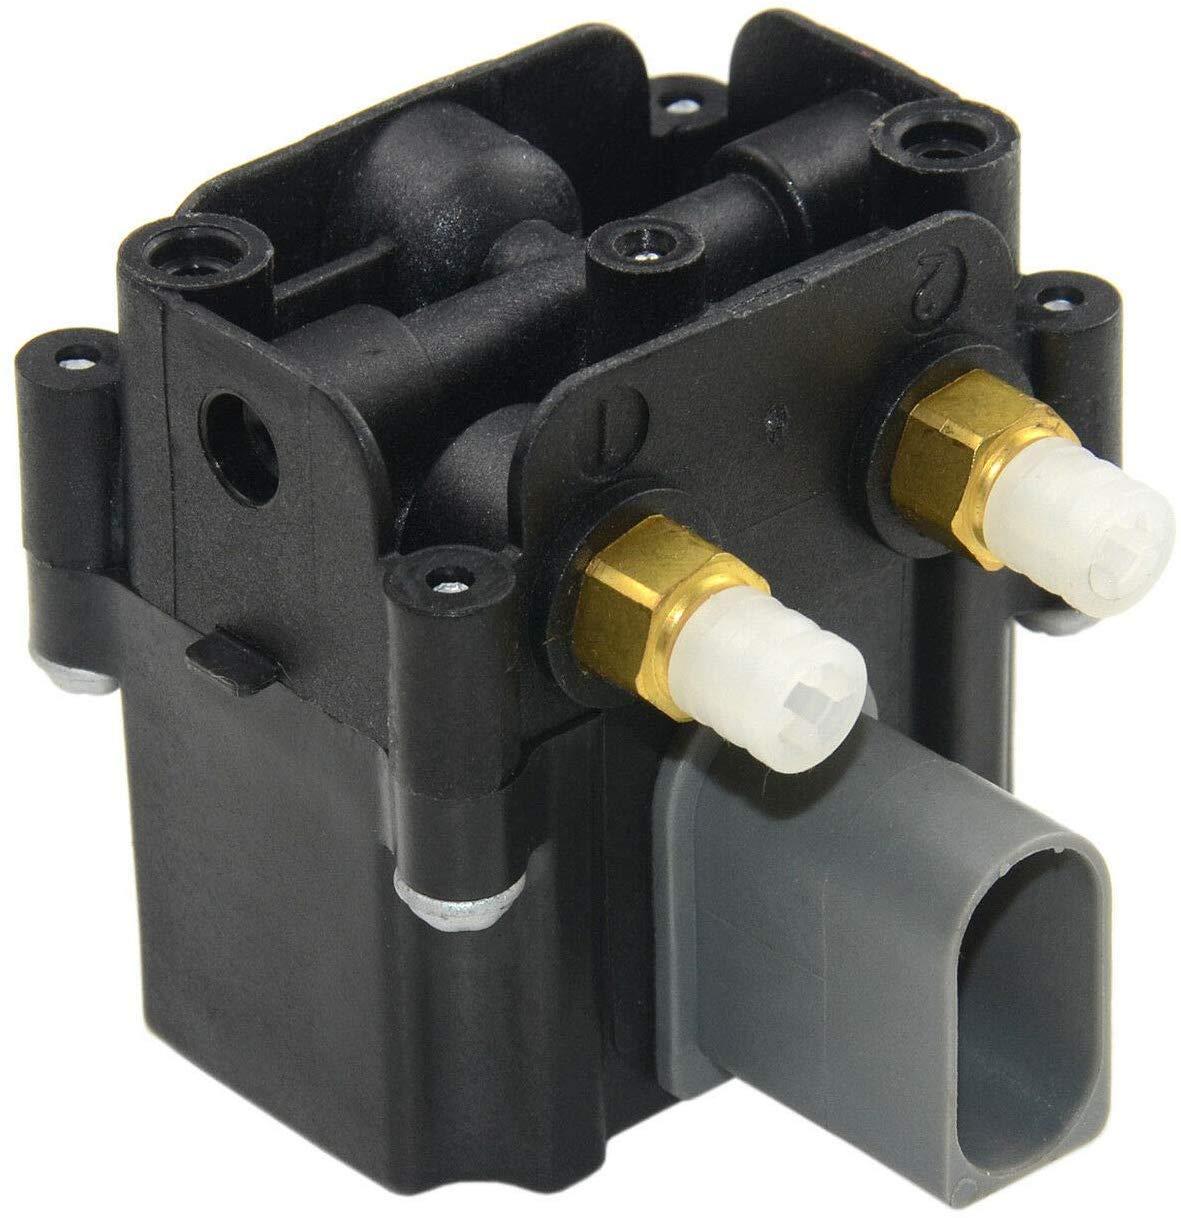 MSQ-CD Air Suspension Solenoid Valve Block 37206789450 37206864215 For BMW F01 F02 F07 F11 740i 750i 760Li 37236769082 37206868998 4722555610